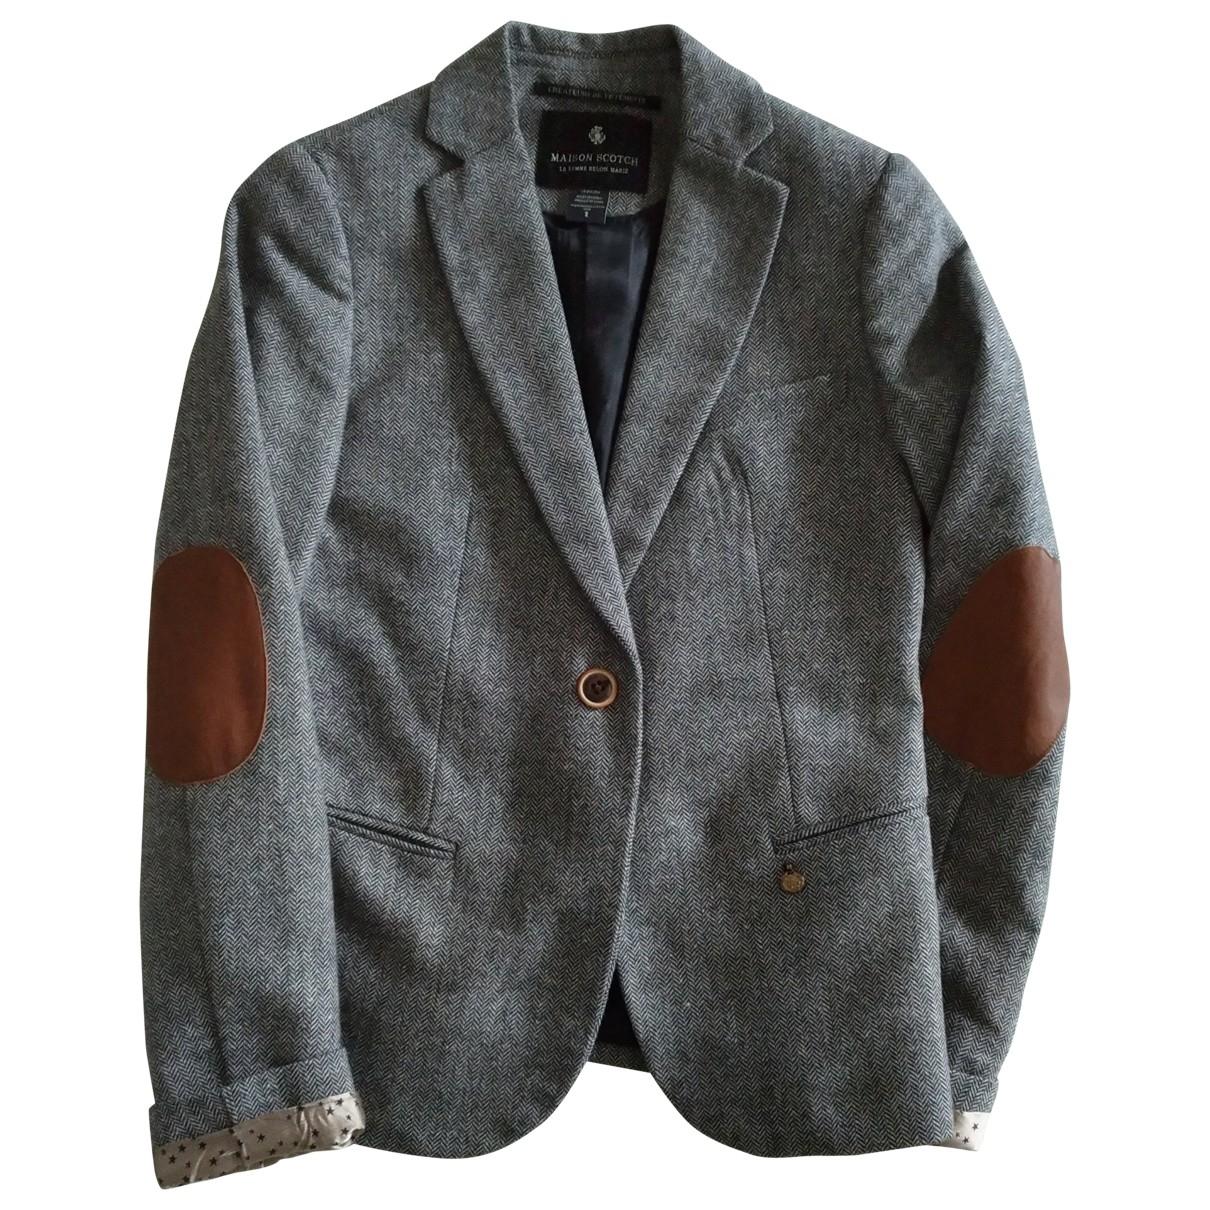 Maison Scotch \N Grey Wool jacket for Women S International